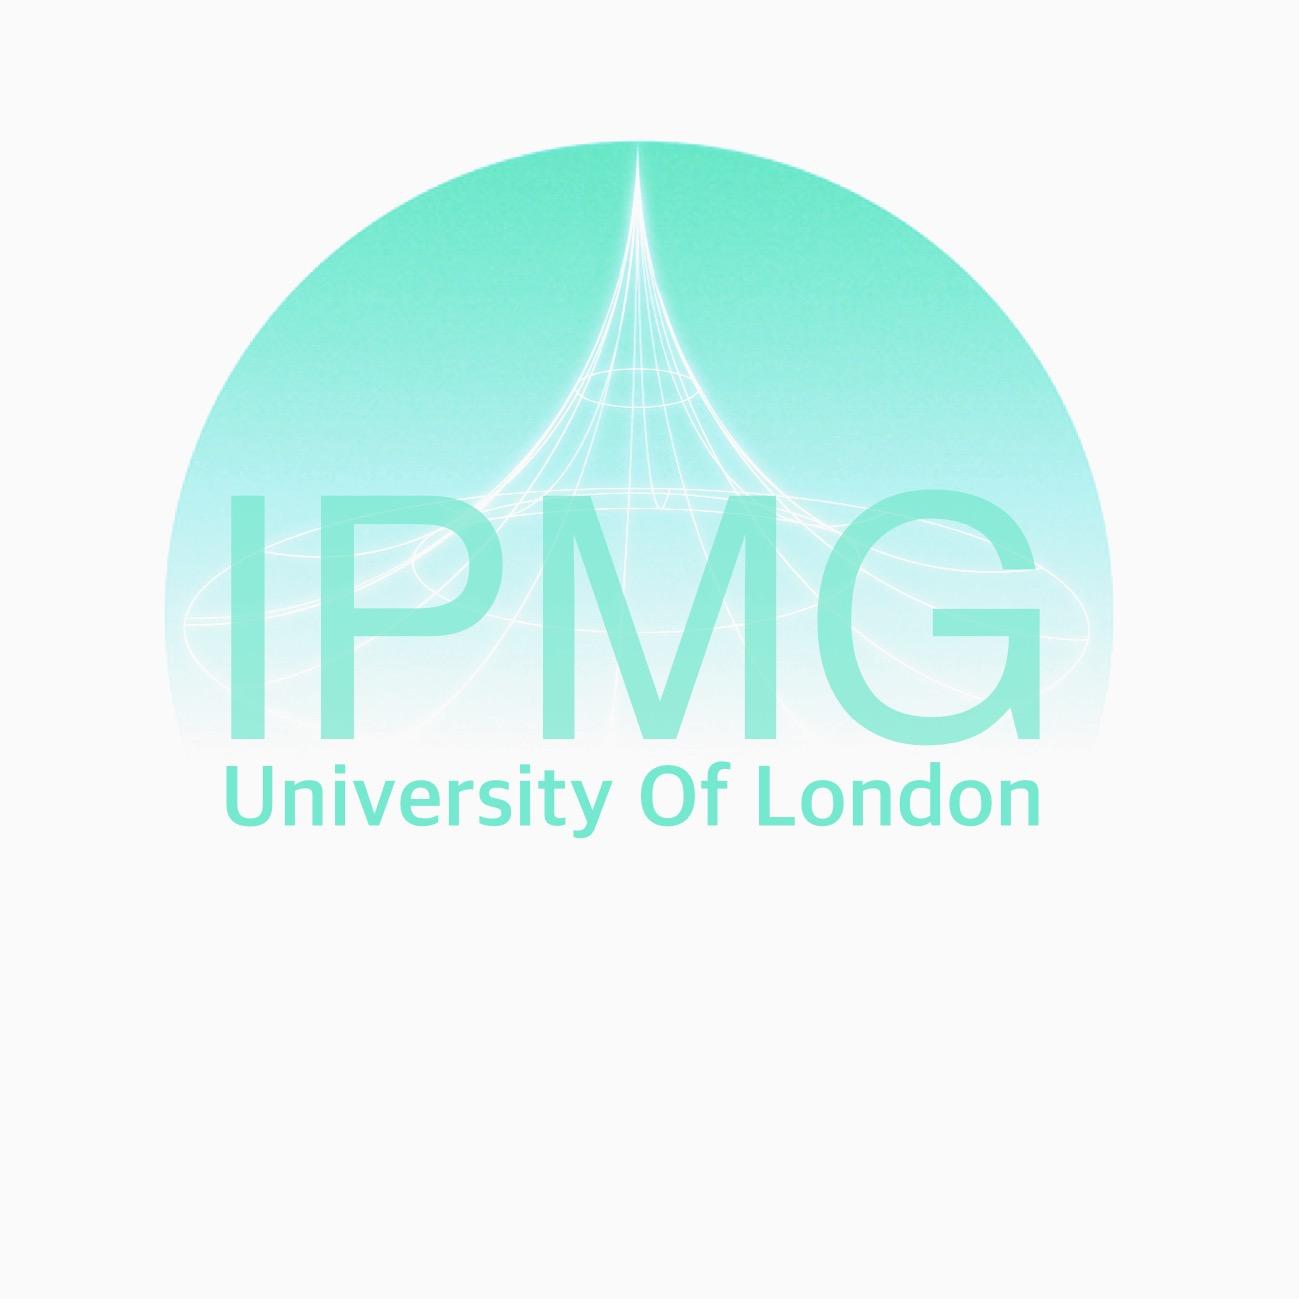 IPMG University of London